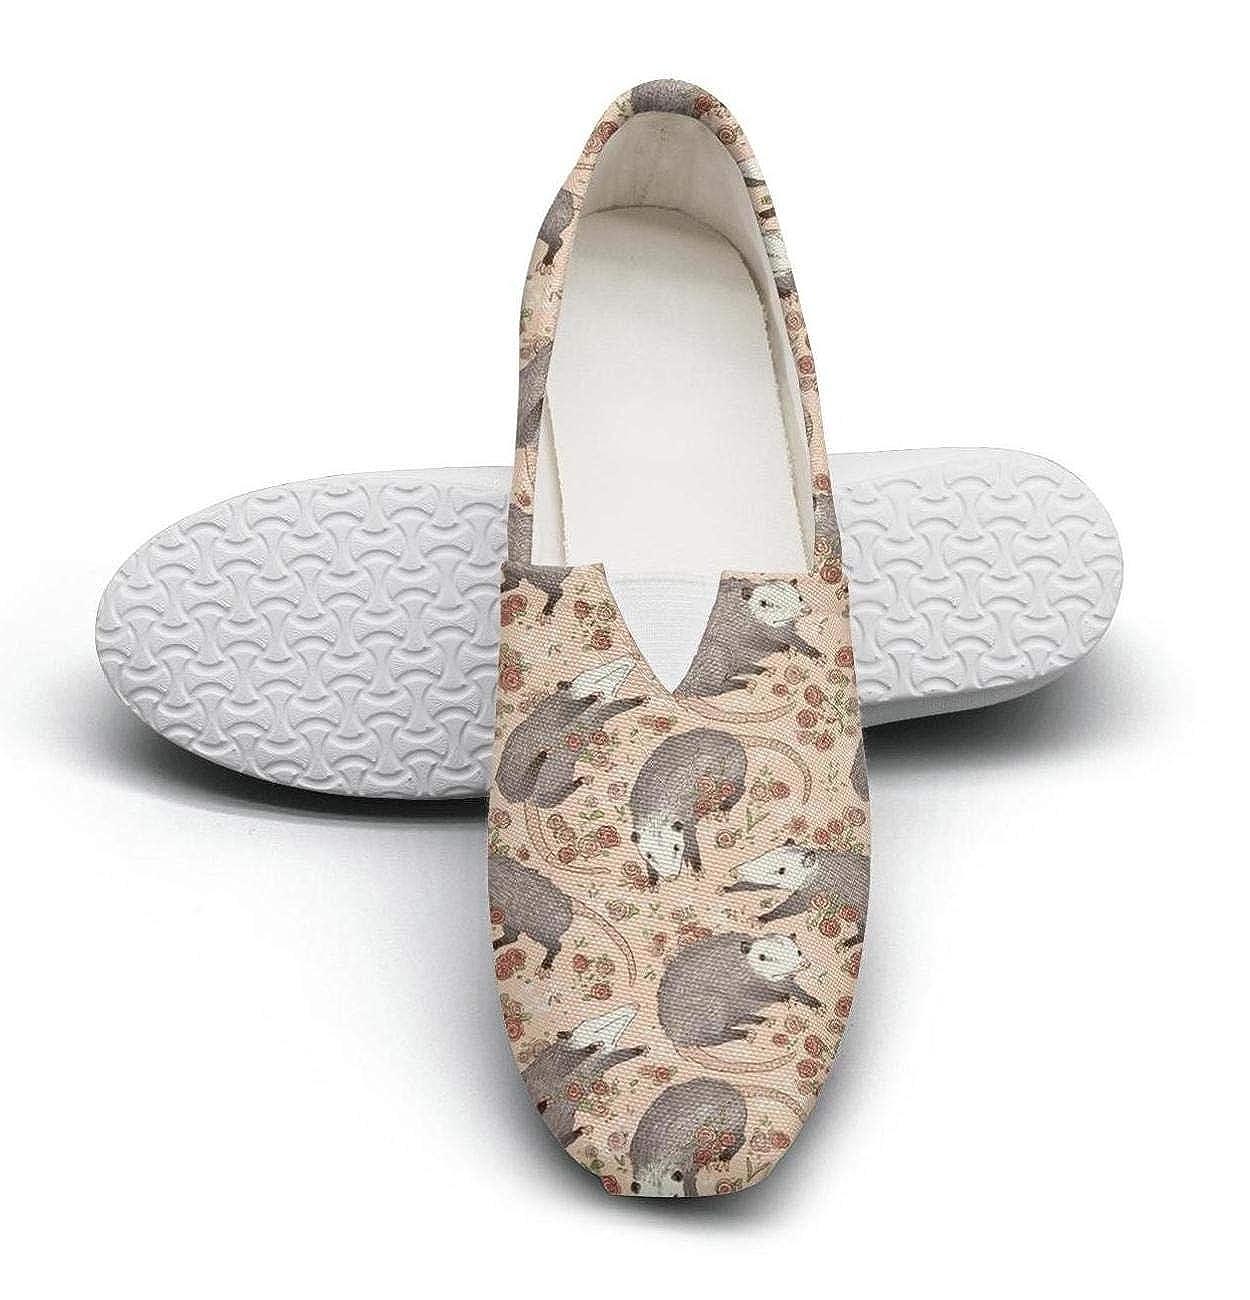 nkfbx Opossum Fashion Slip-On Sneakers for Girls Exercise